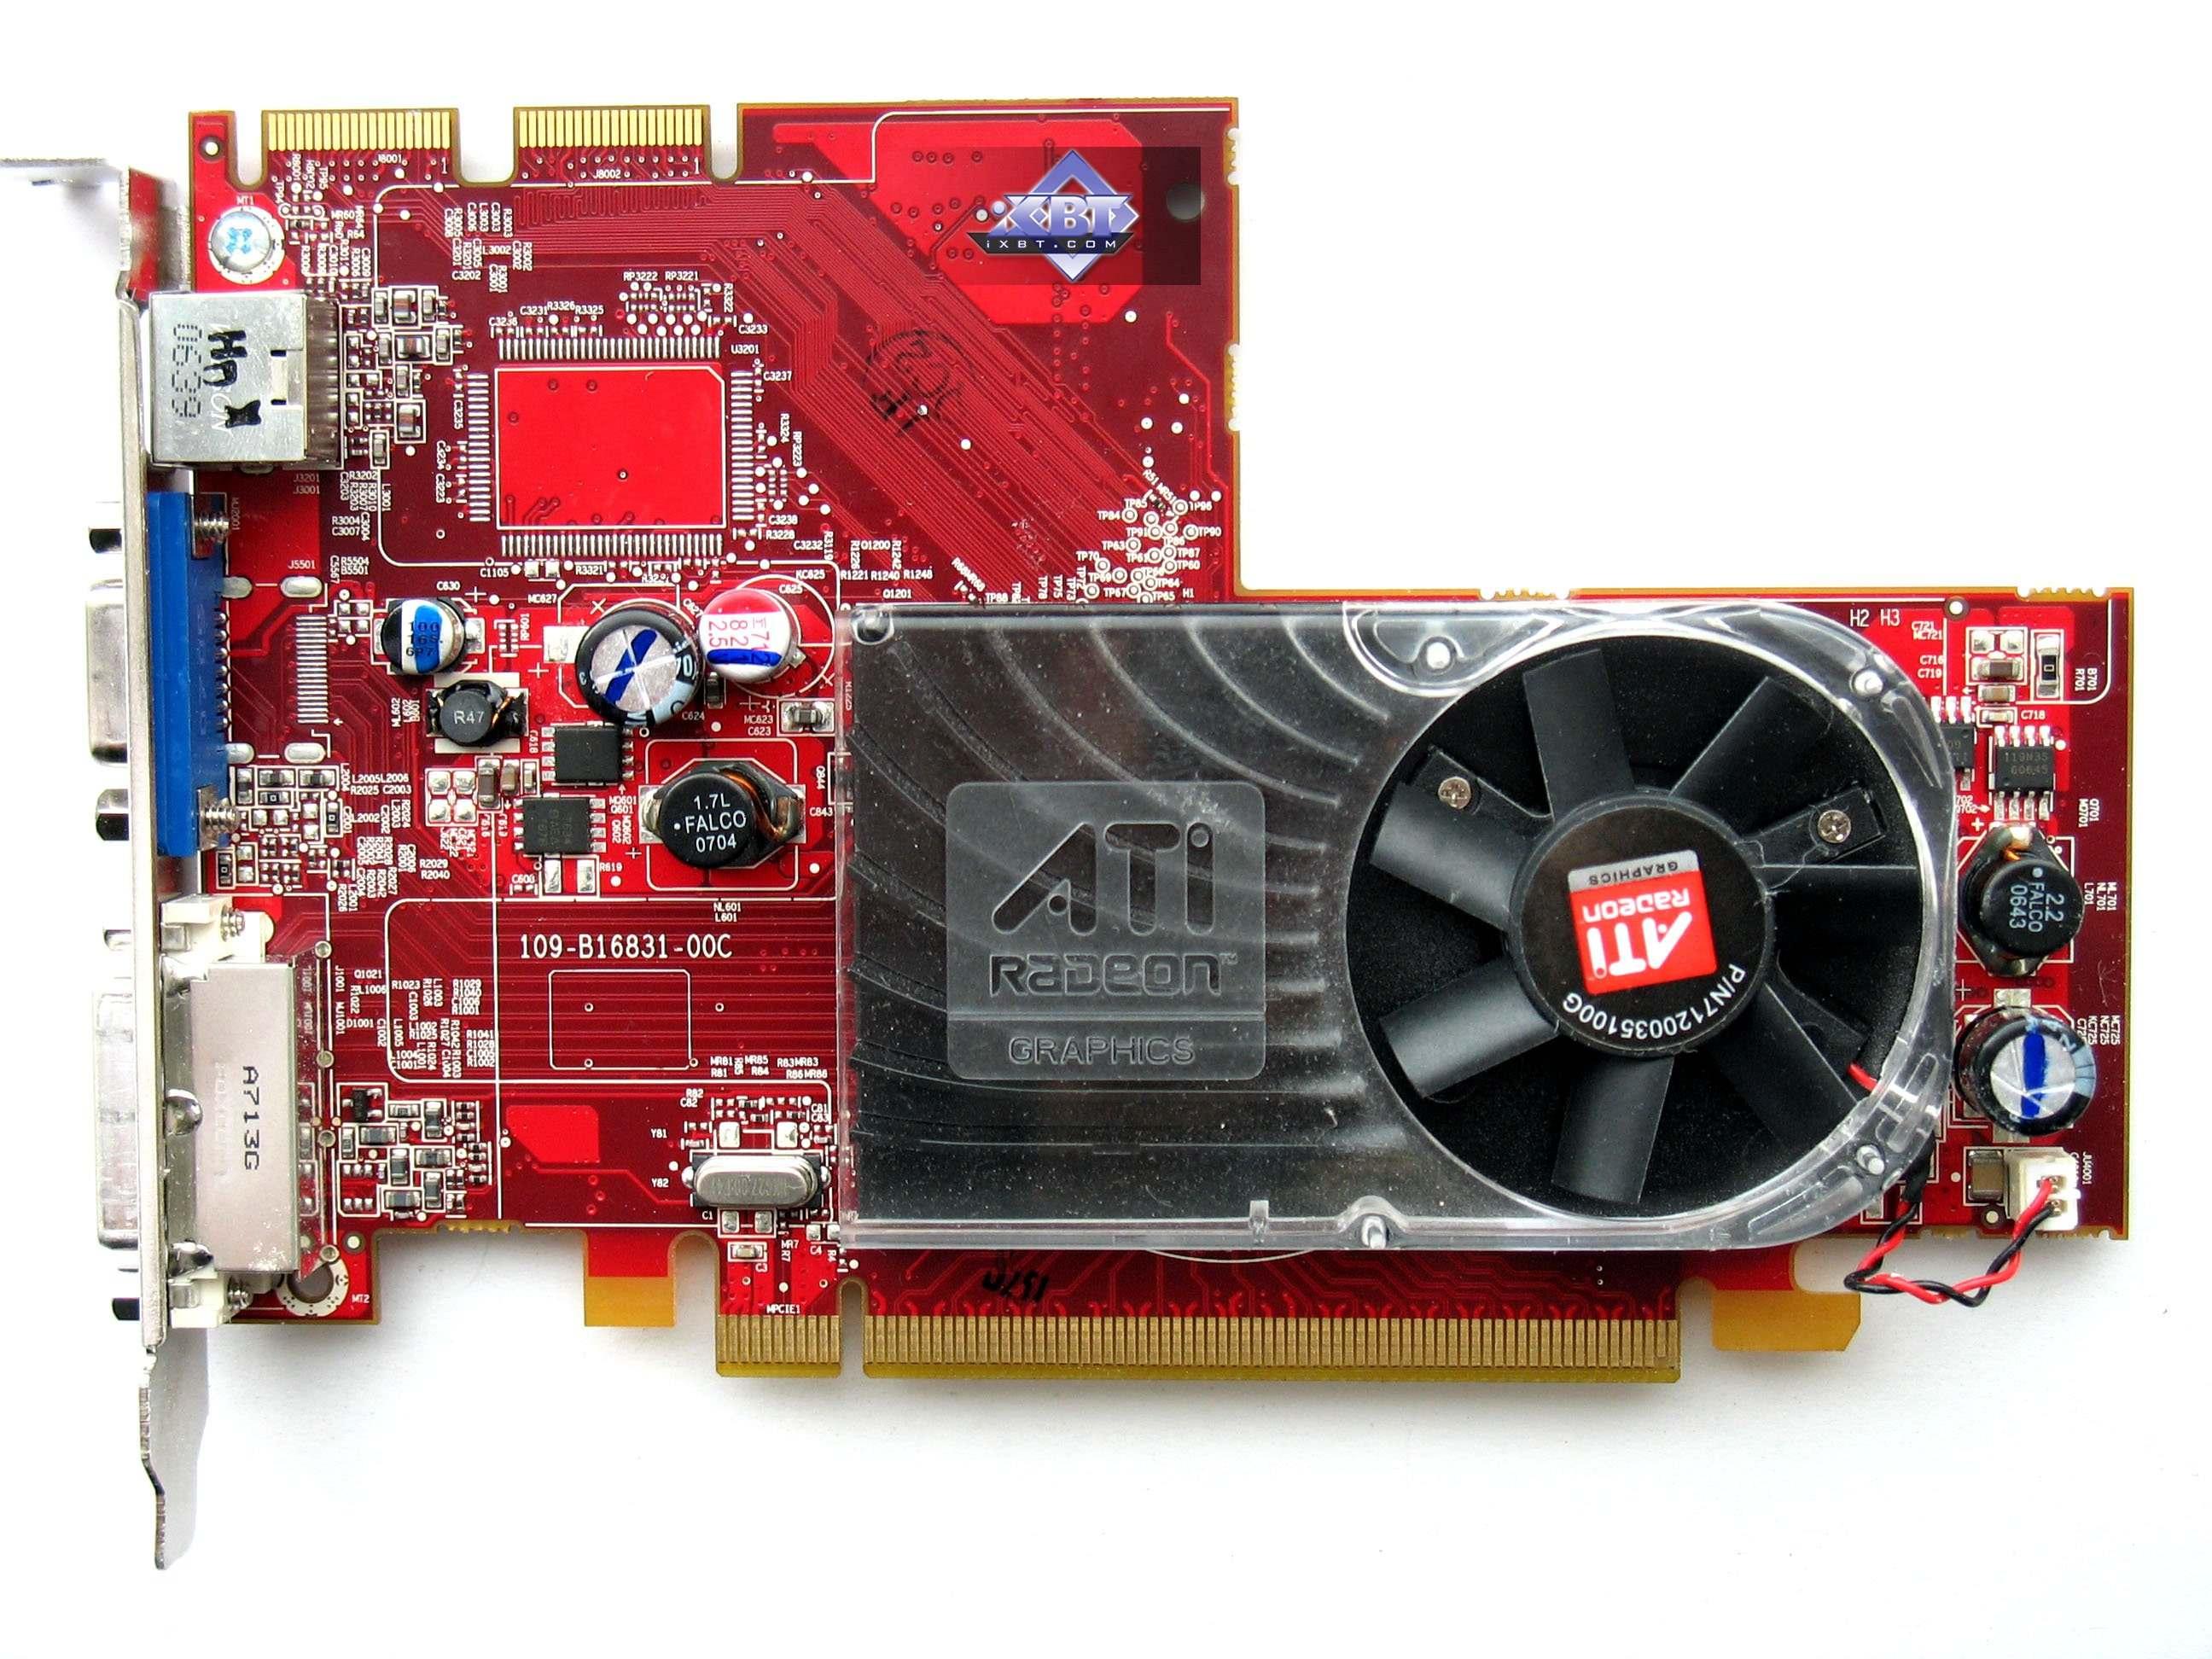 AMD/ATI Mobility Radeon X1300 drivers for Windows XP 32bit (33 files)